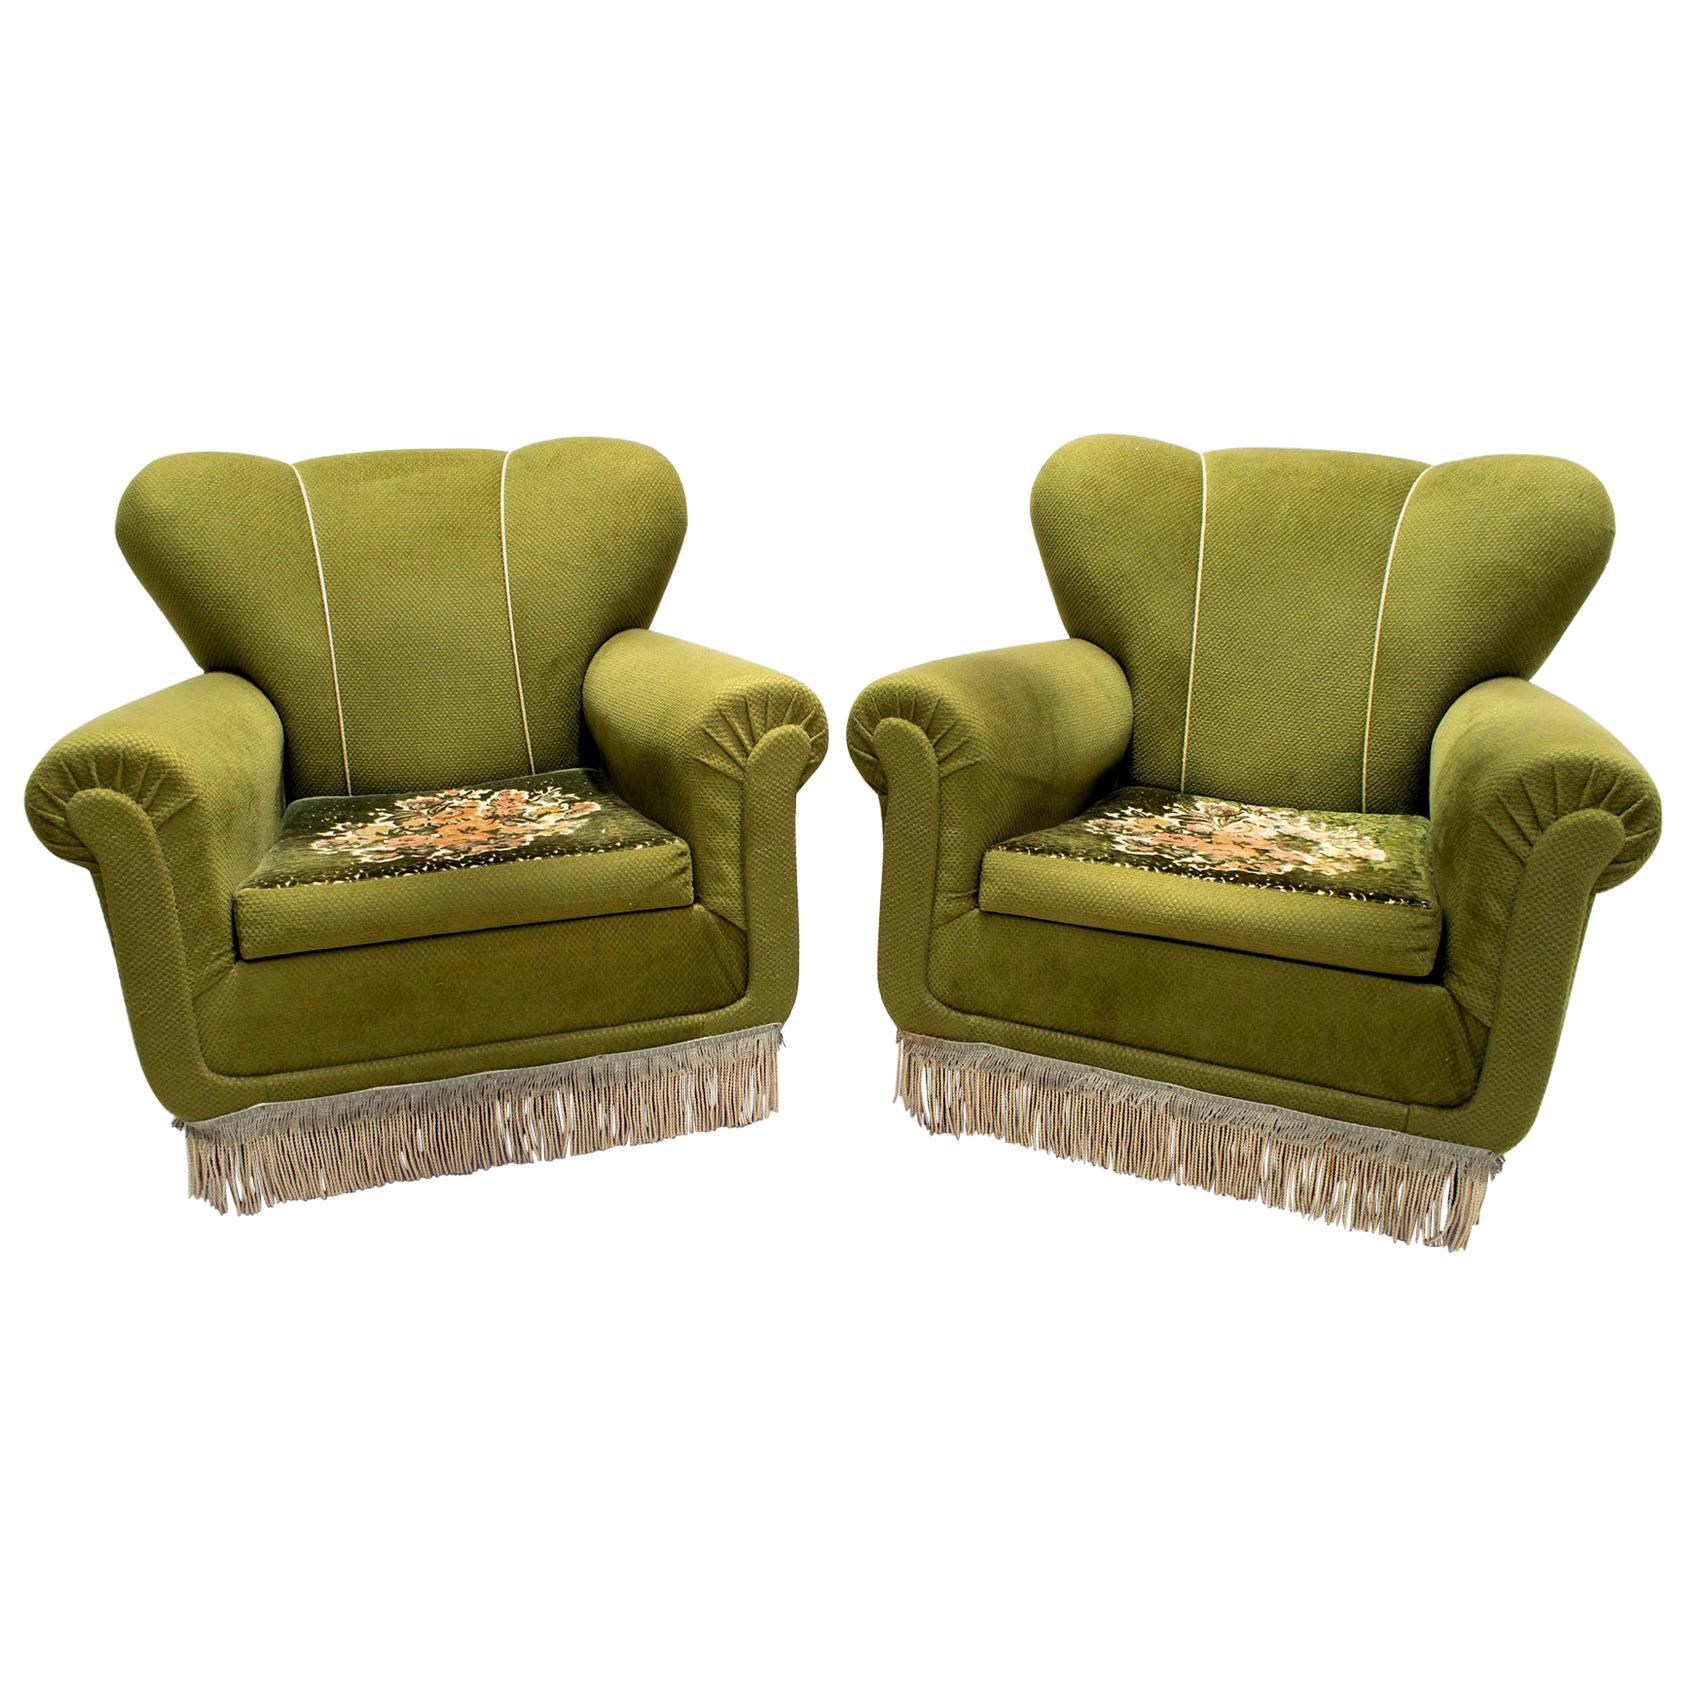 Pair of Midcentury Italian Original Cladding Armchairs, 1950s